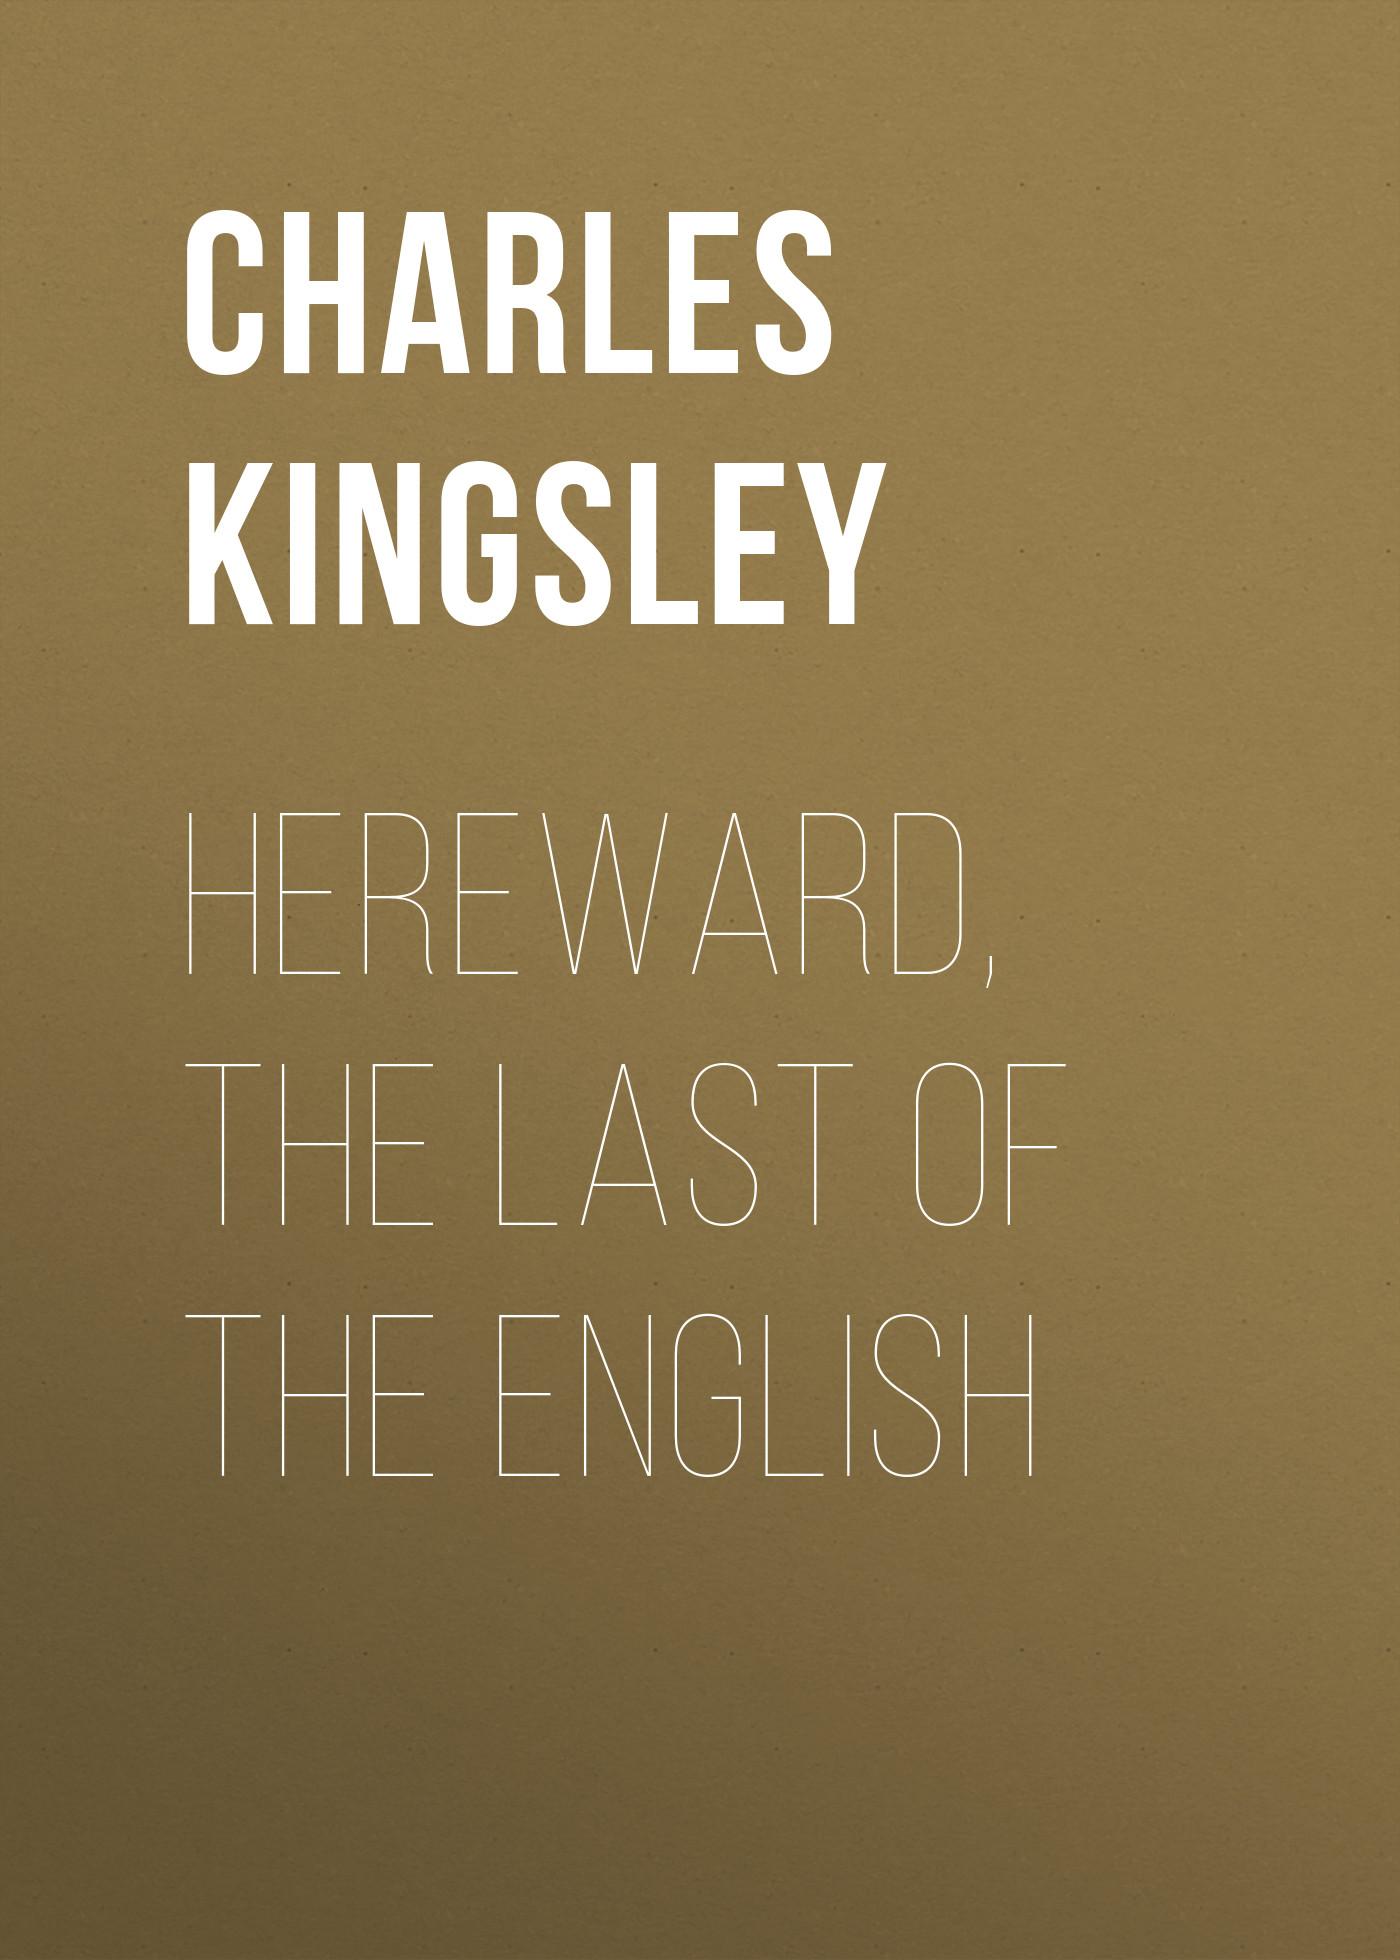 Charles Kingsley Hereward, the Last of the English hereward carrington the coming science